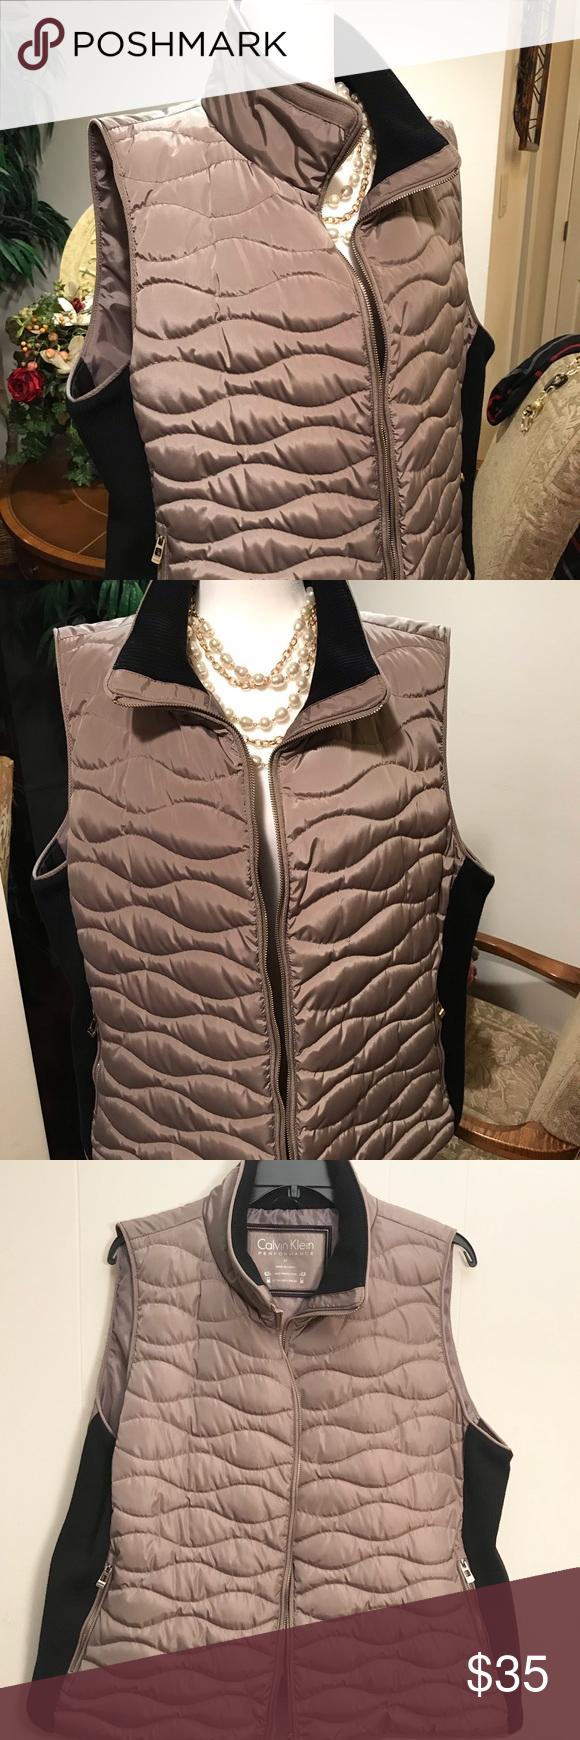 New Calvin Klein Performance Puffer Jacket Vest Vest Jacket Calvin Klein Clothes Design [ 1740 x 580 Pixel ]